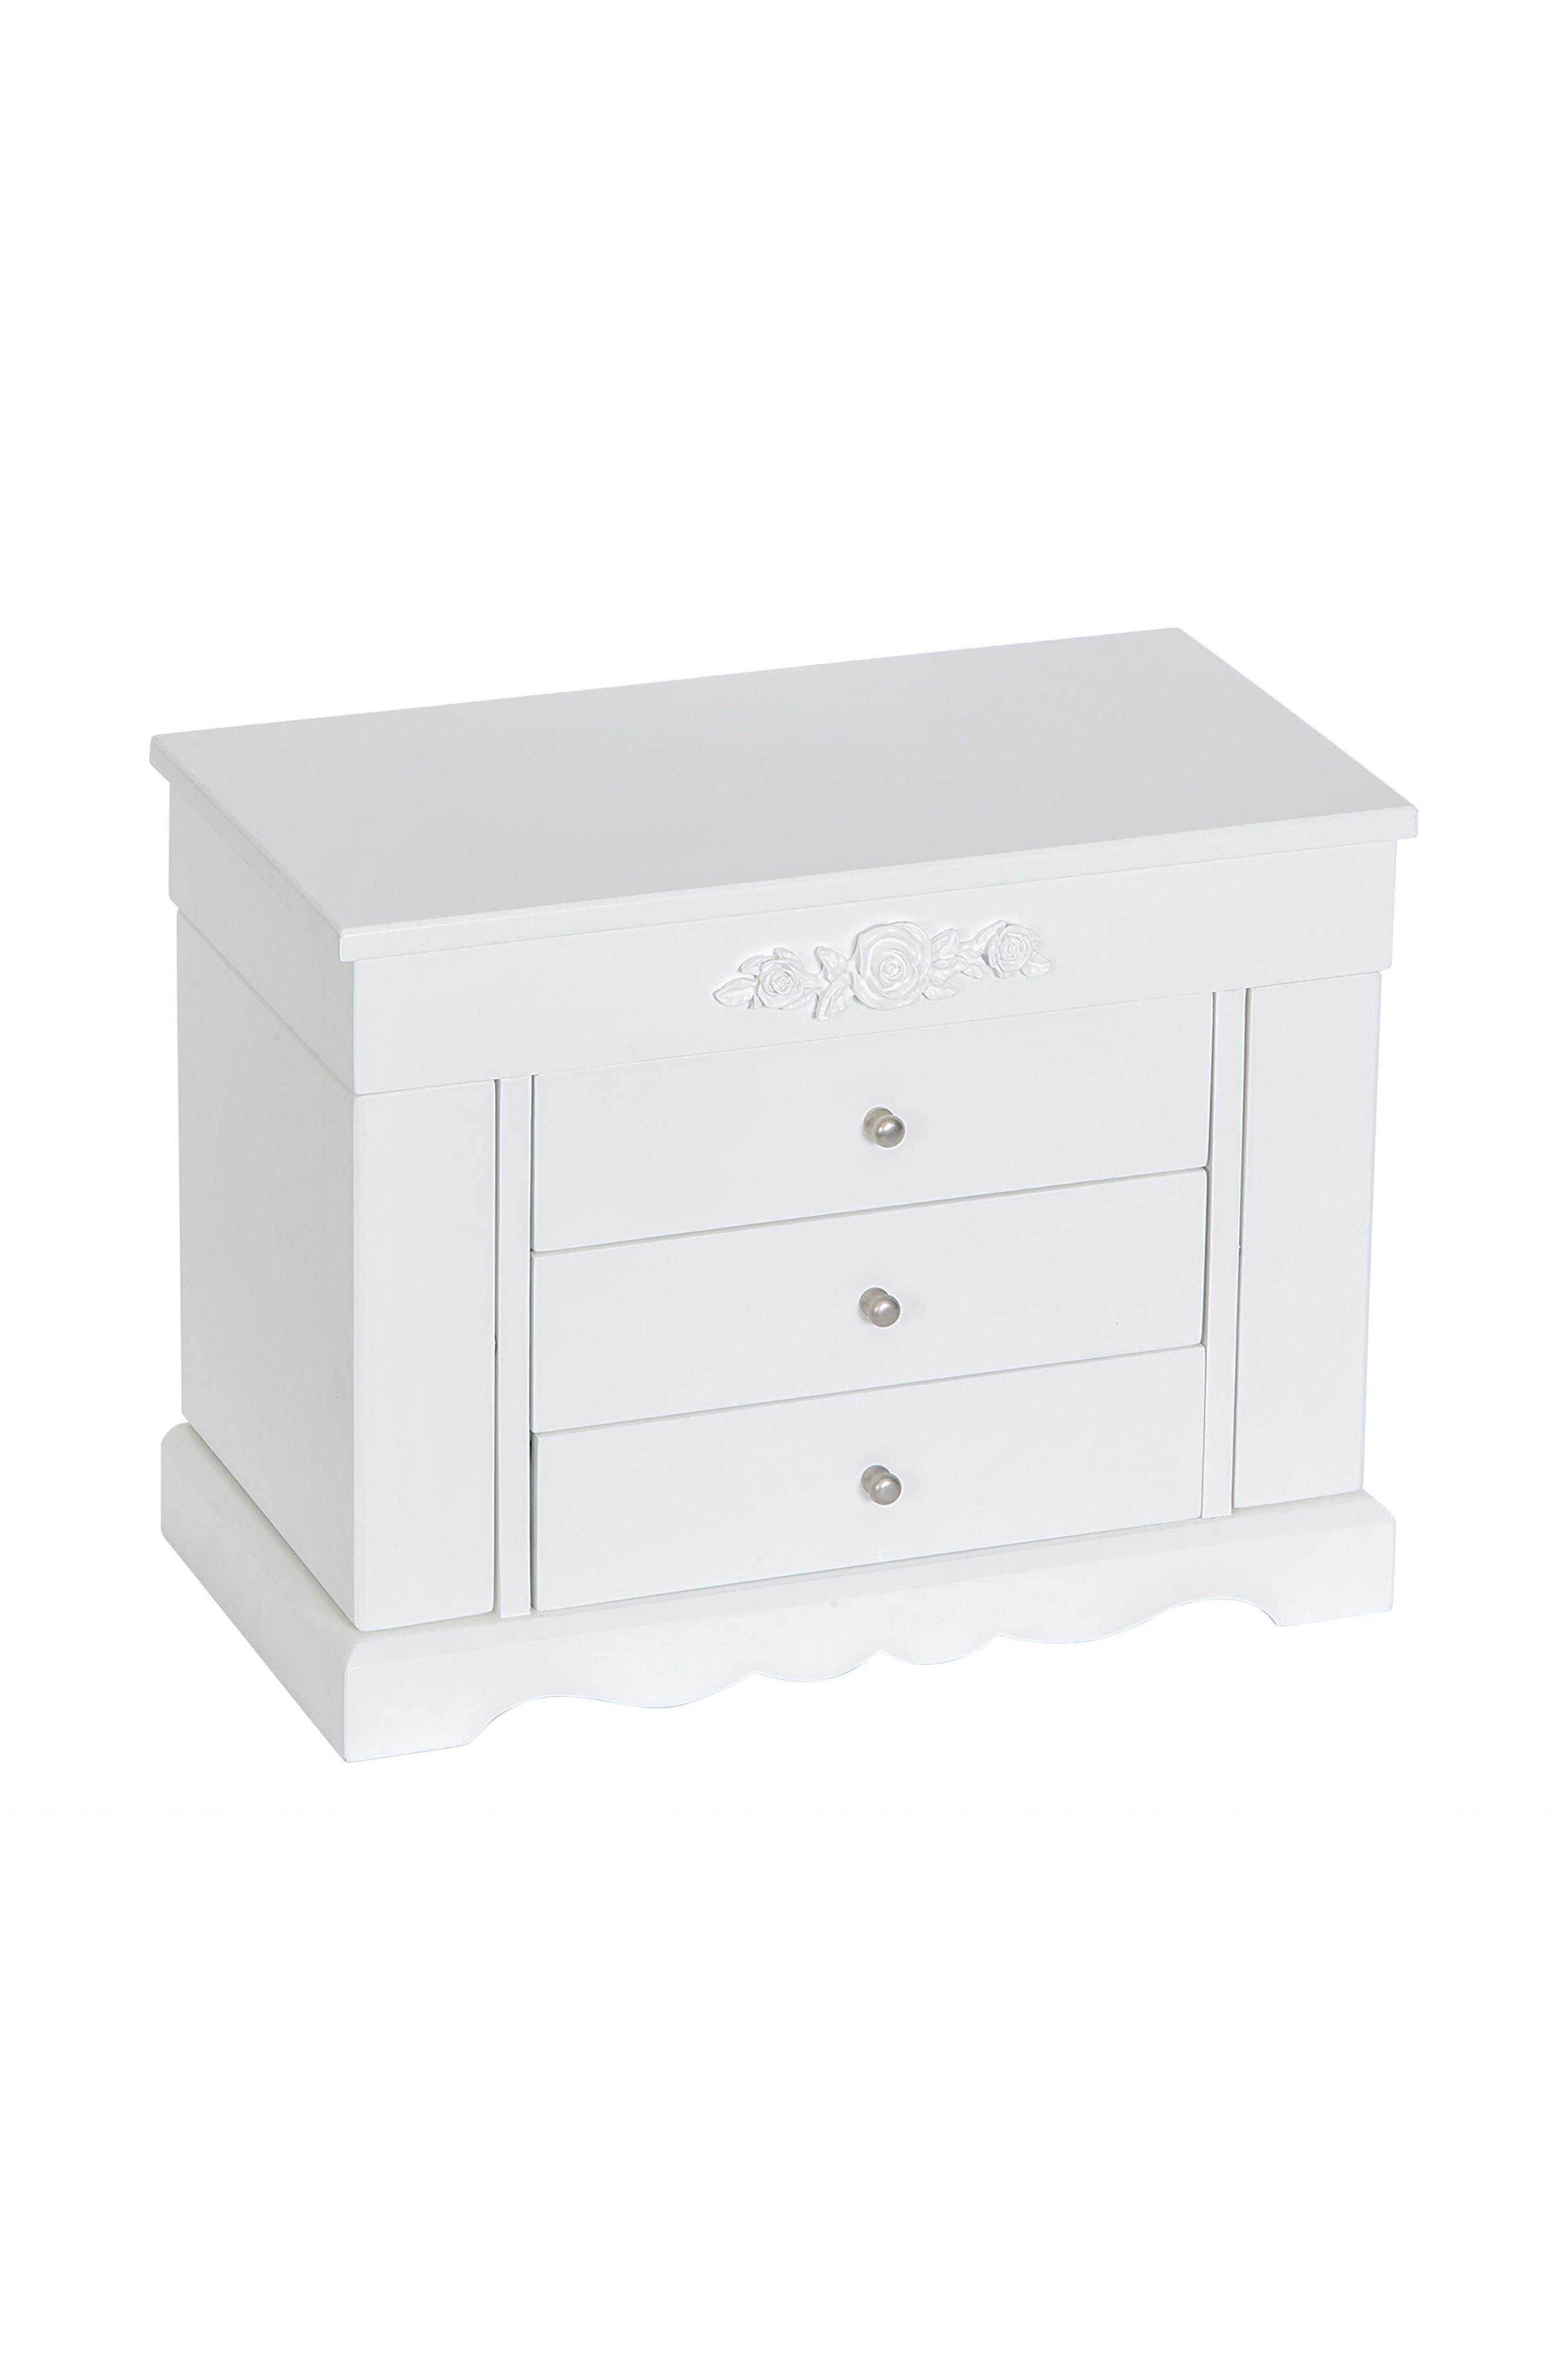 Montague Jewelry Box,                             Main thumbnail 1, color,                             White